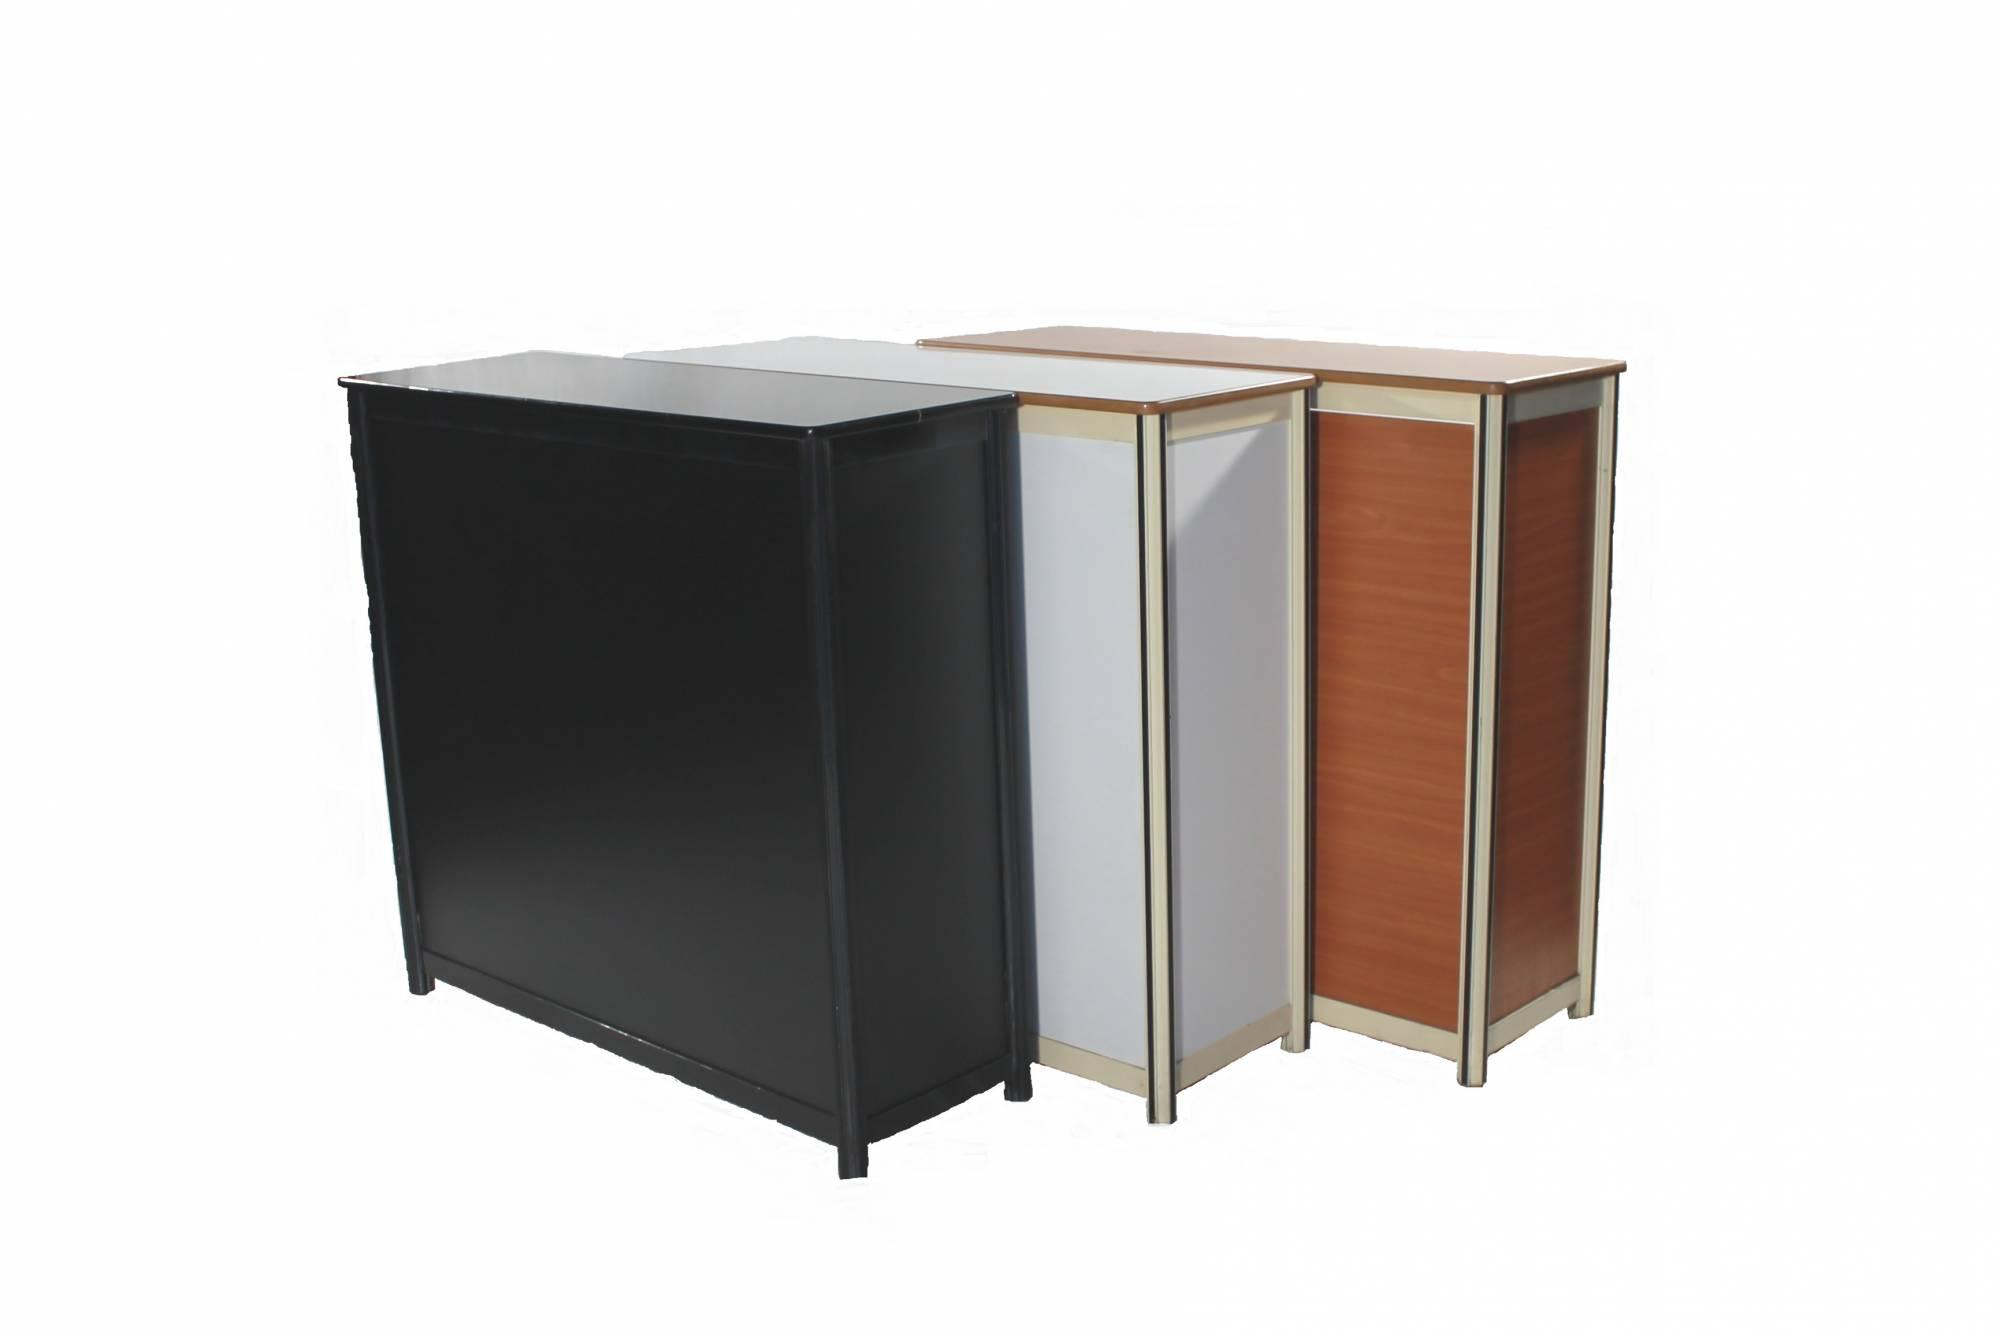 prix location d 39 un chapiteau lyon 69 interloc. Black Bedroom Furniture Sets. Home Design Ideas